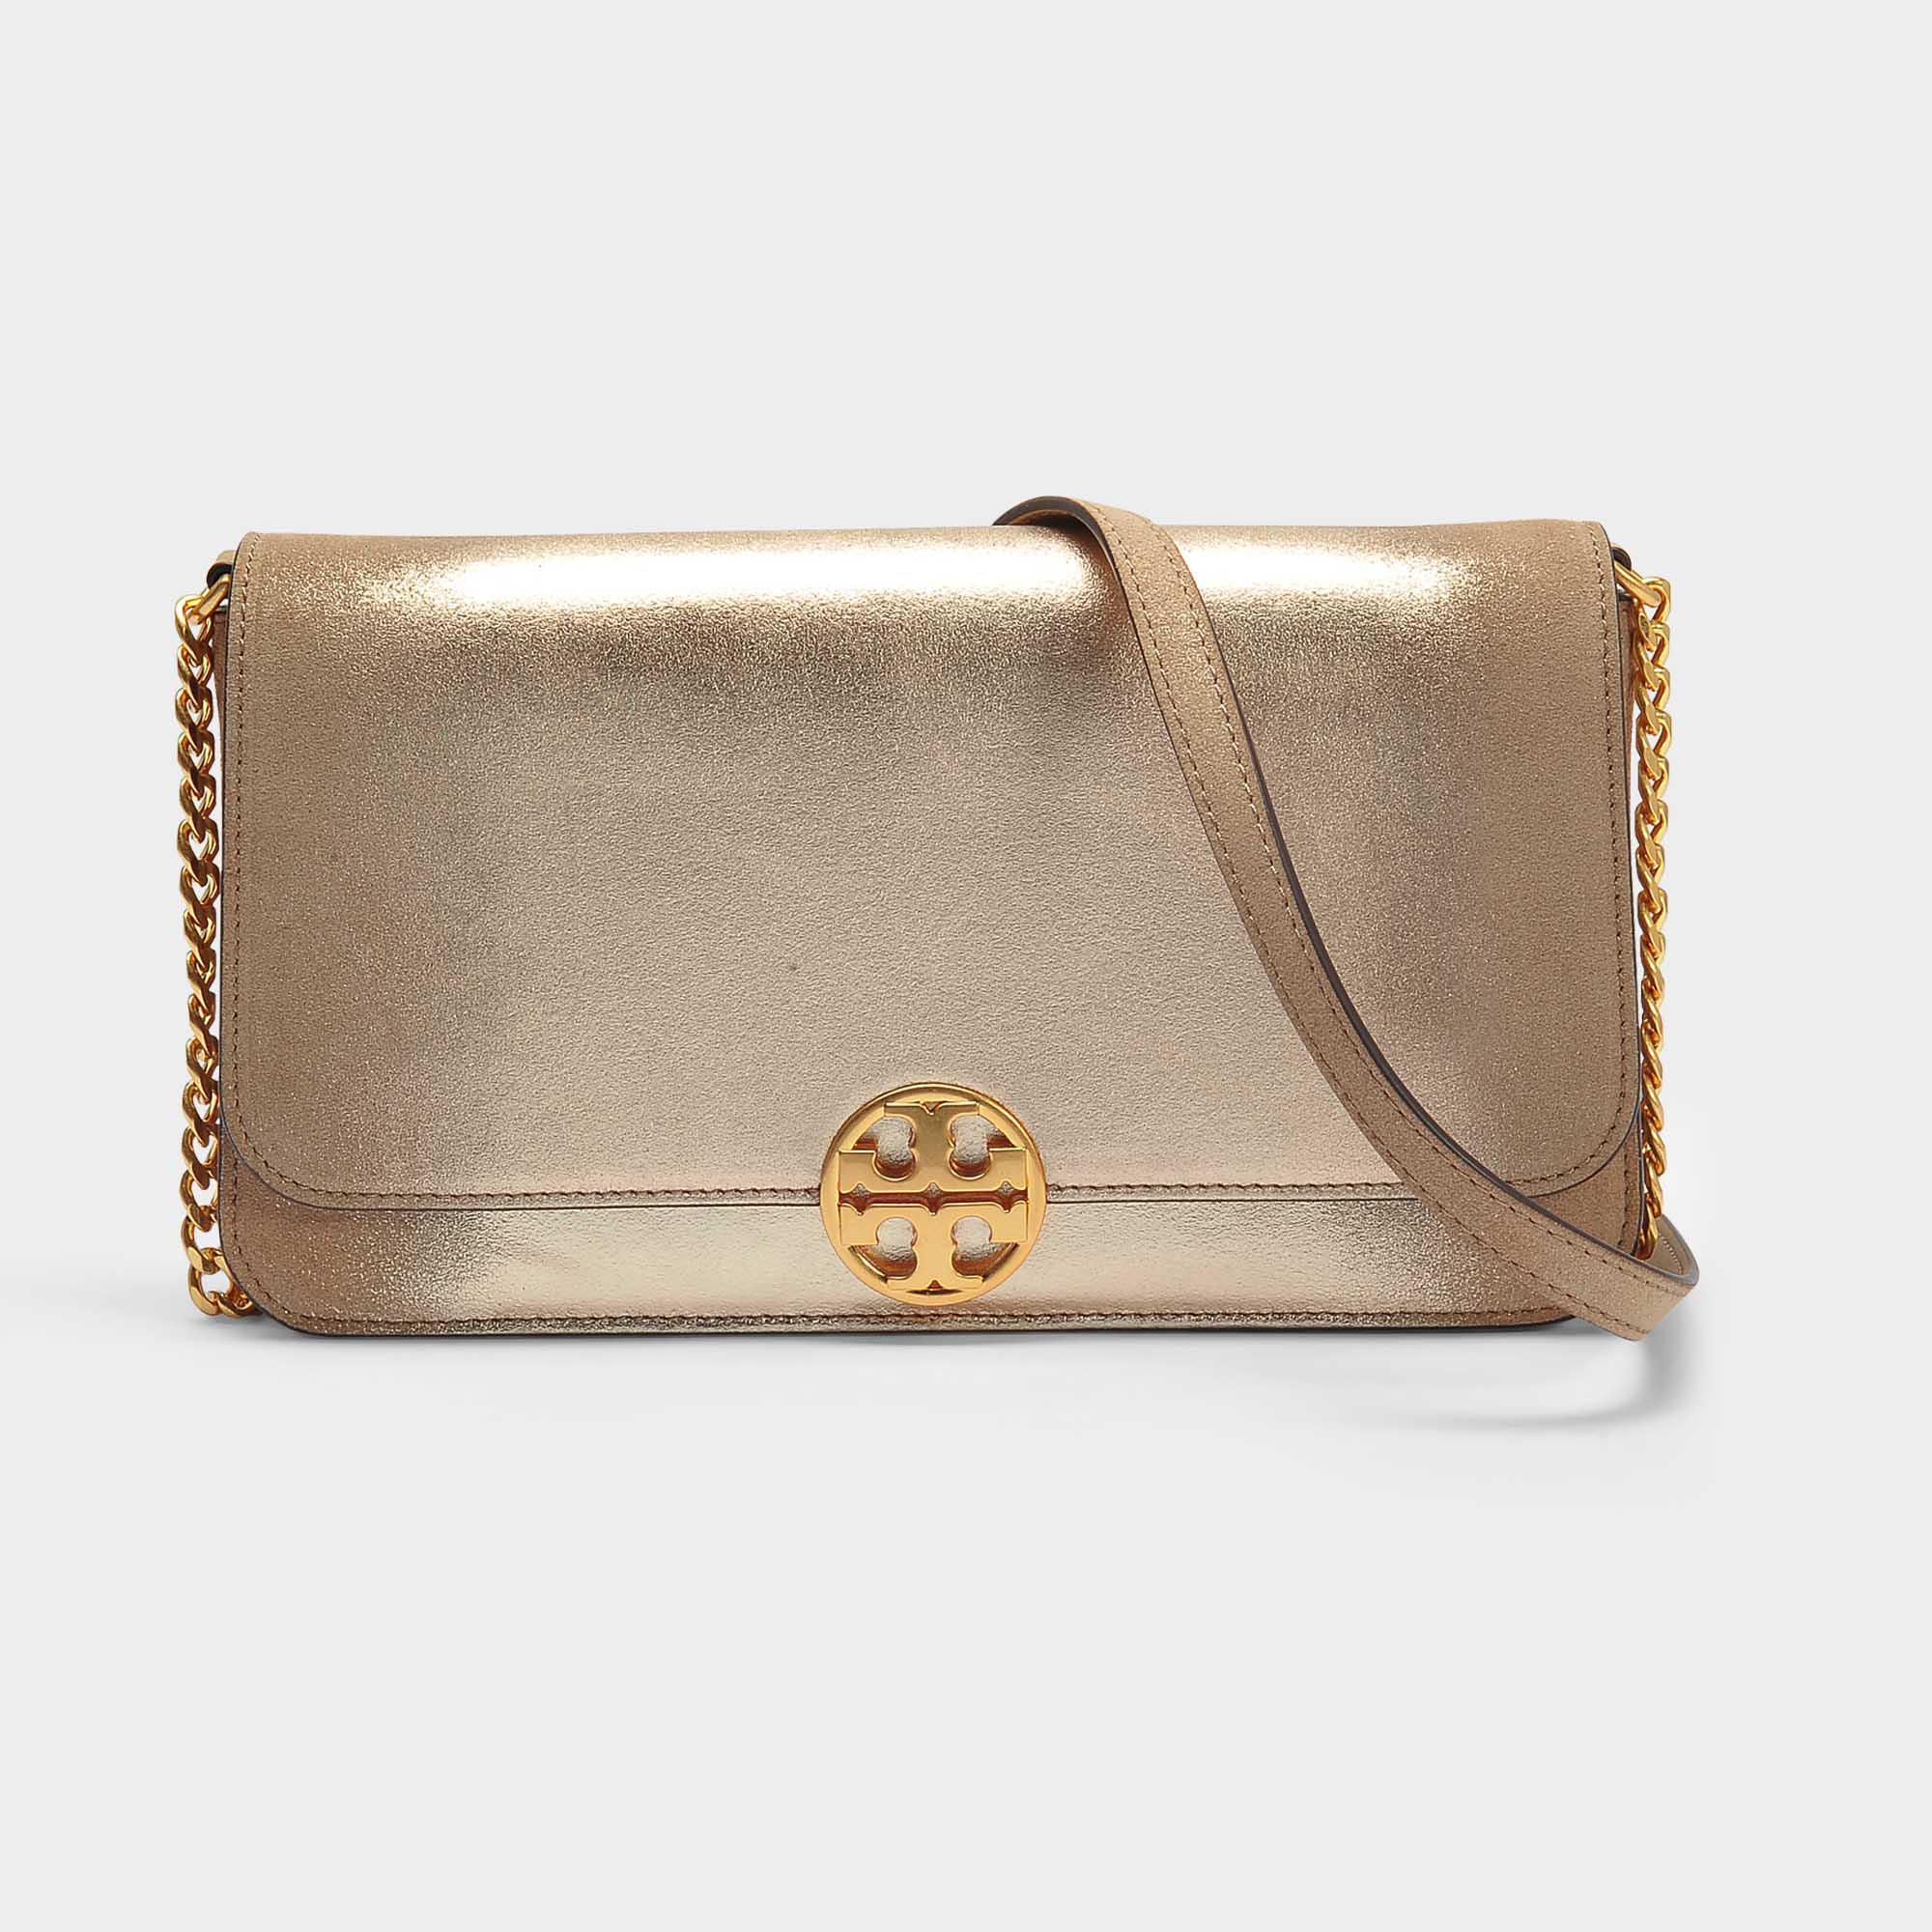 Chelsea Convertible Clutch Bag in Black Calfskin Tory Burch KxVNy